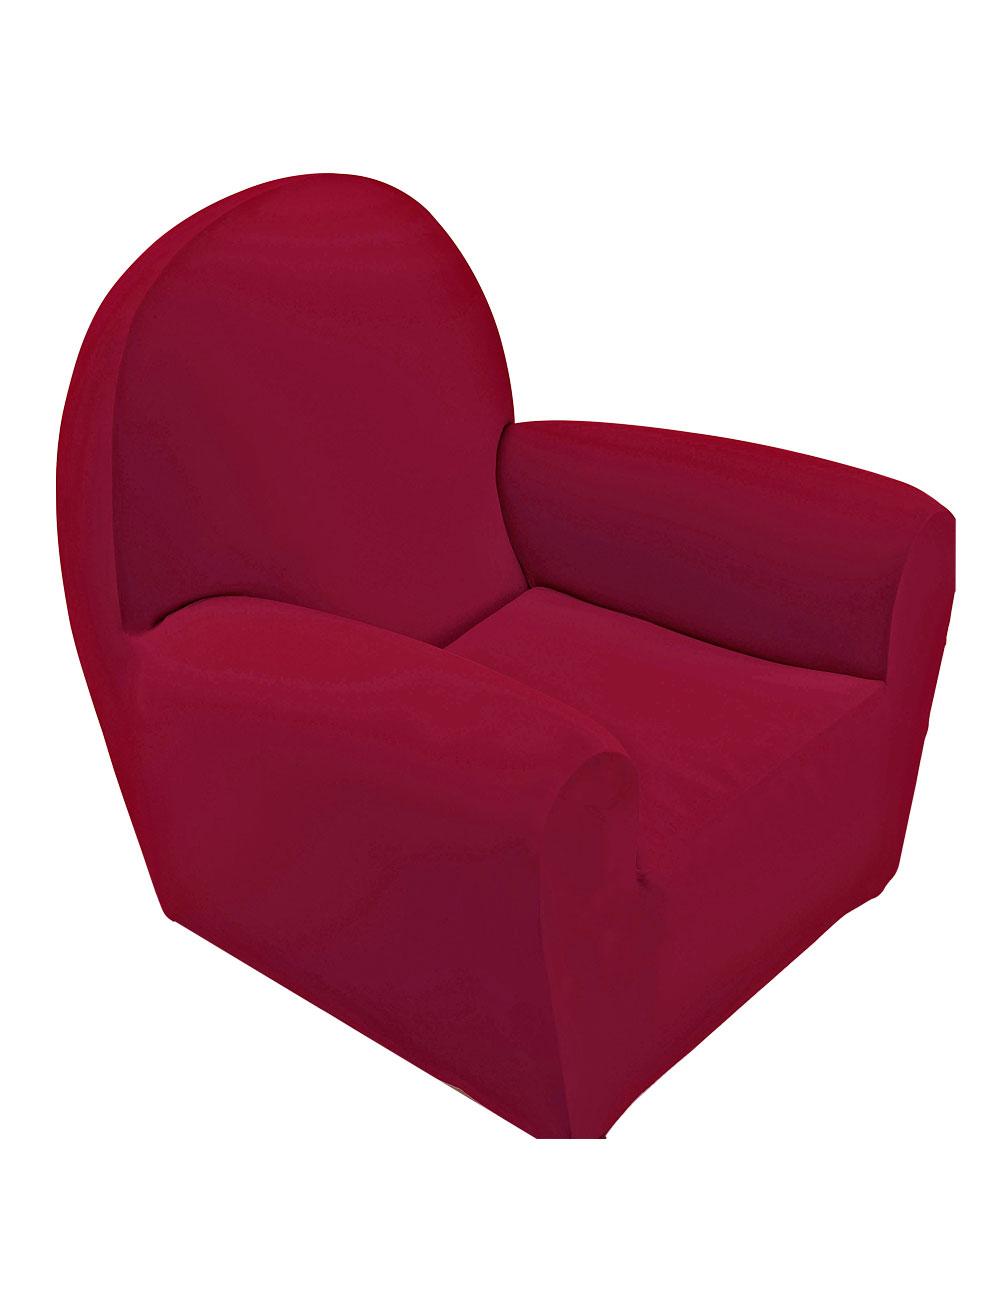 bi elastischer berzug f r eck sofa 380 530 cm rot. Black Bedroom Furniture Sets. Home Design Ideas